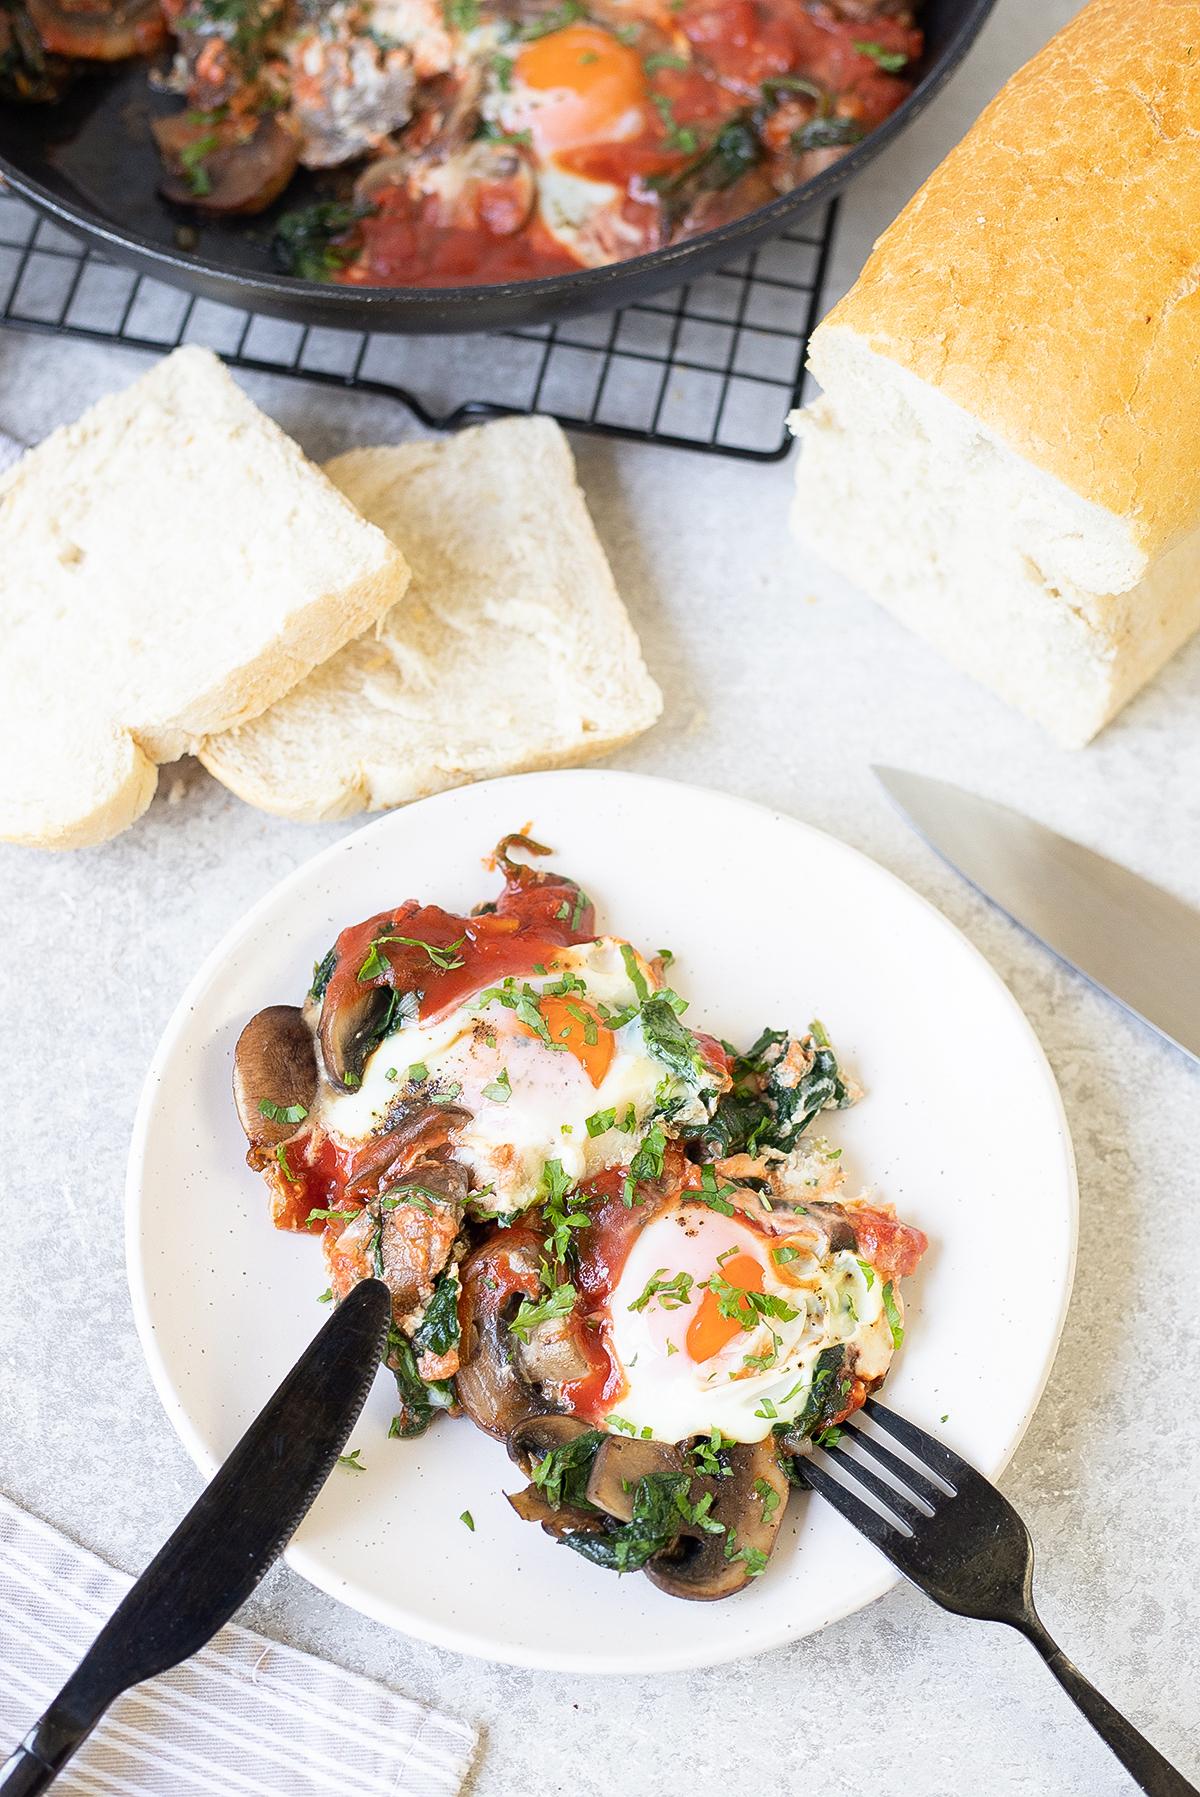 toast, plate and knife.